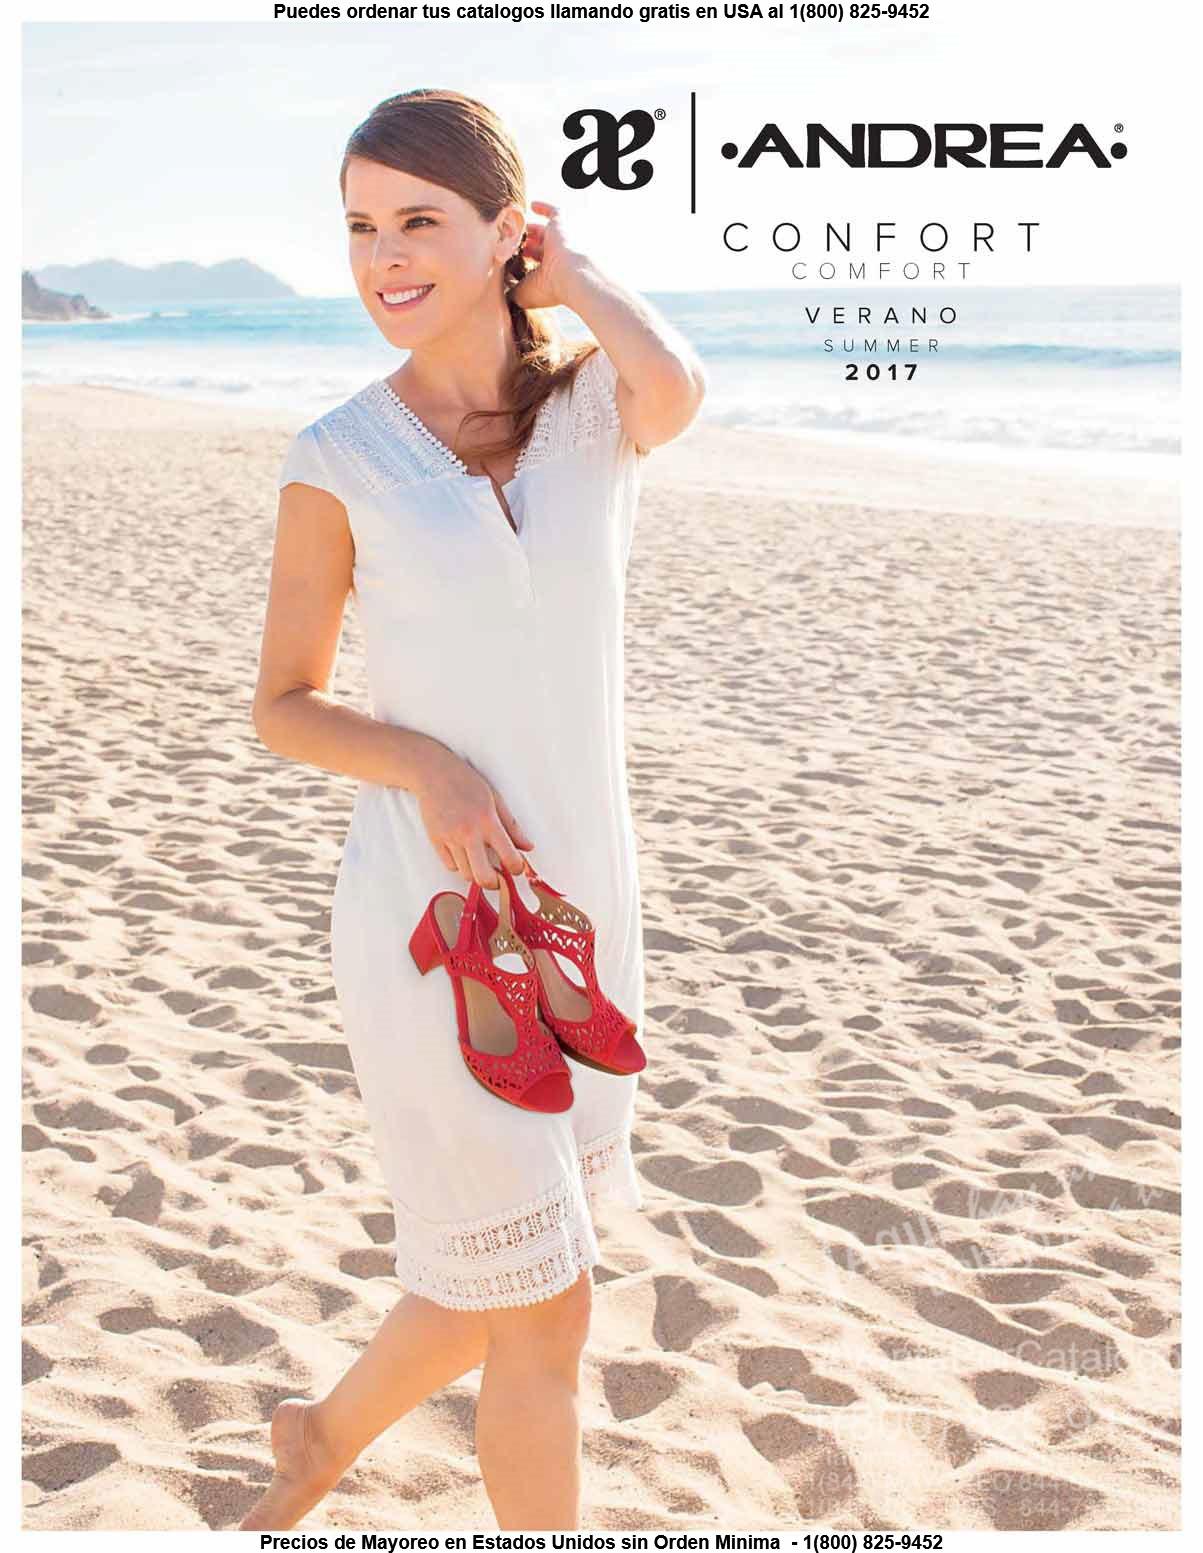 Confort Andrea: Catalogo Calzado Mujer Verano 2017